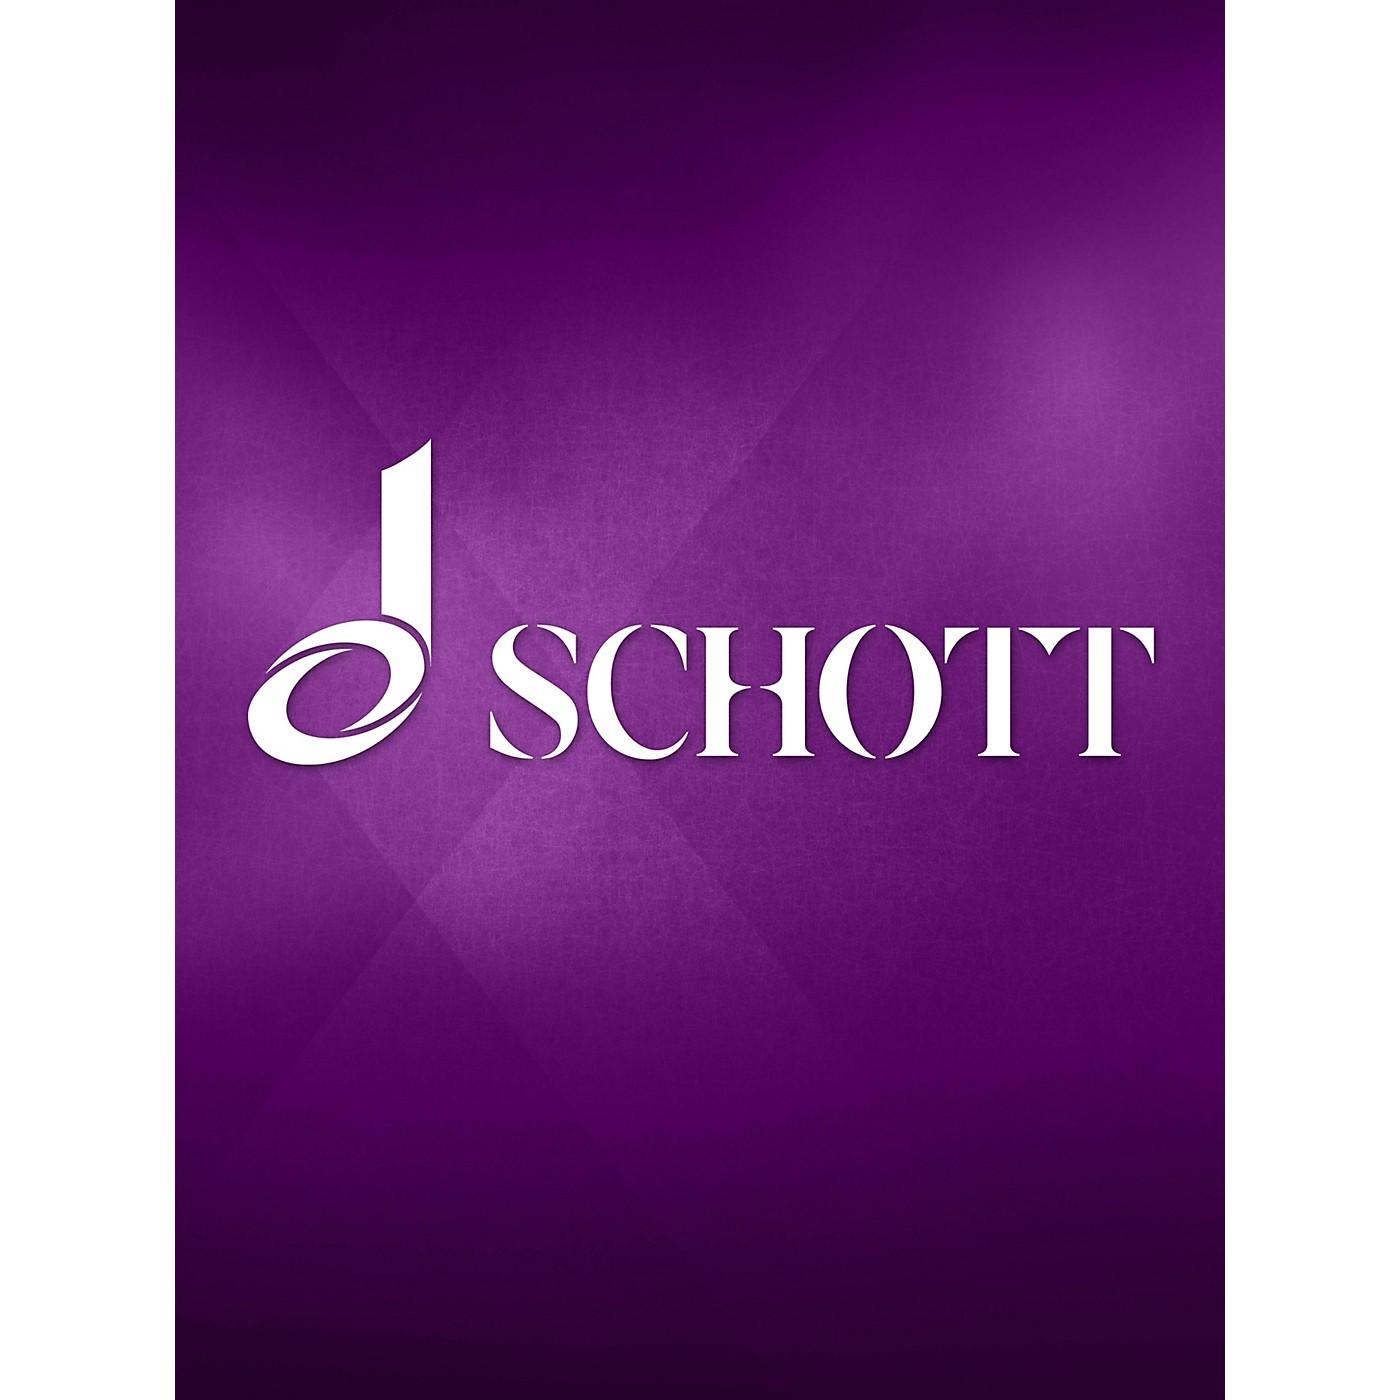 Schott Vienna Sonatinas- Violin 1 (Violin 1 Part) Schott Series Composed by Wolfgang Amadeus Mozart thumbnail